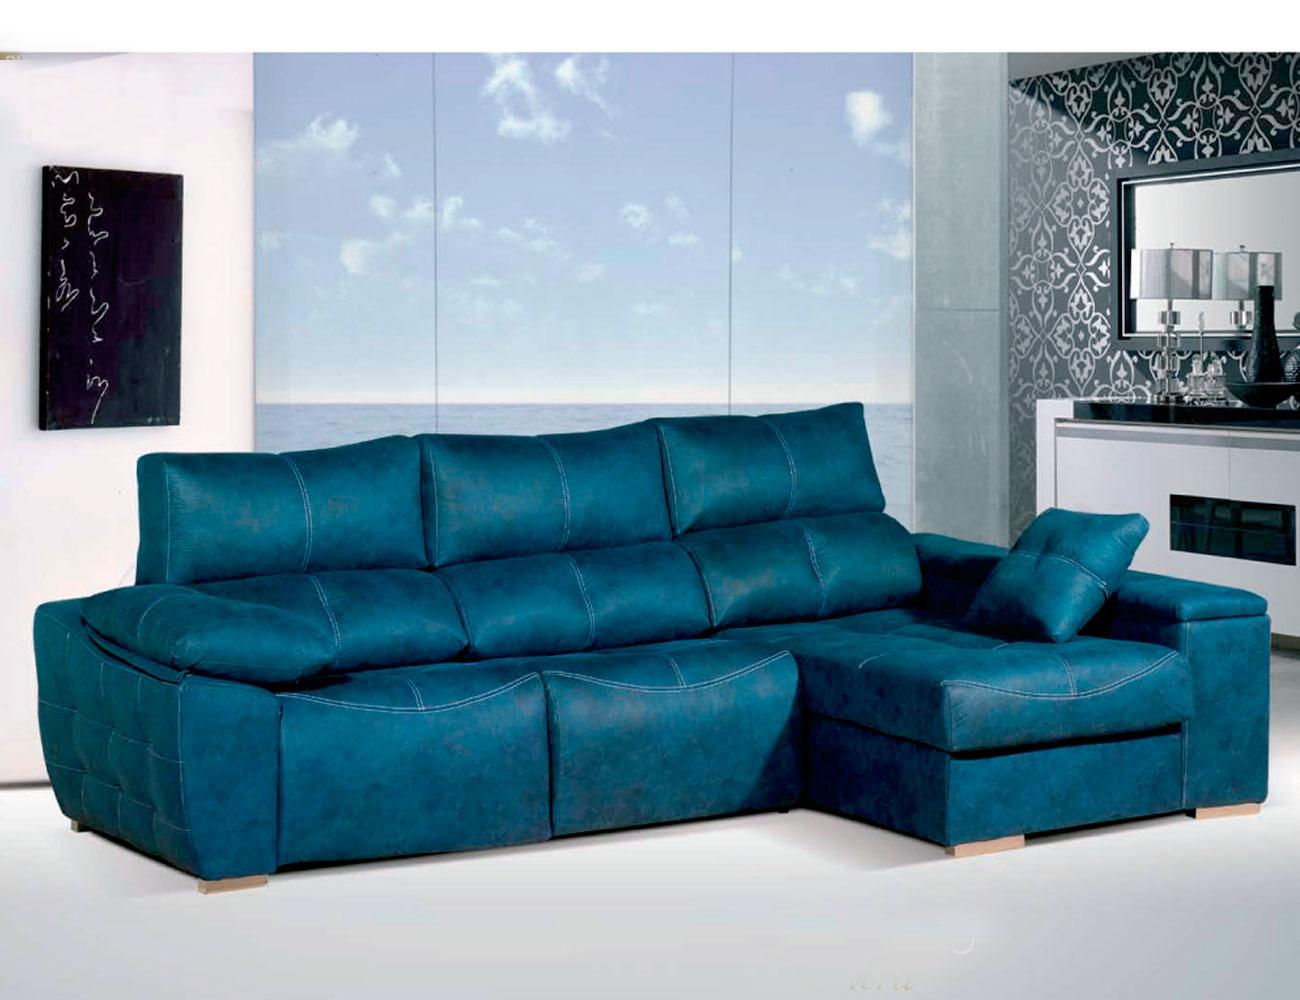 Sofa chaiselongue relax 2 motores anti manchas turquesa1